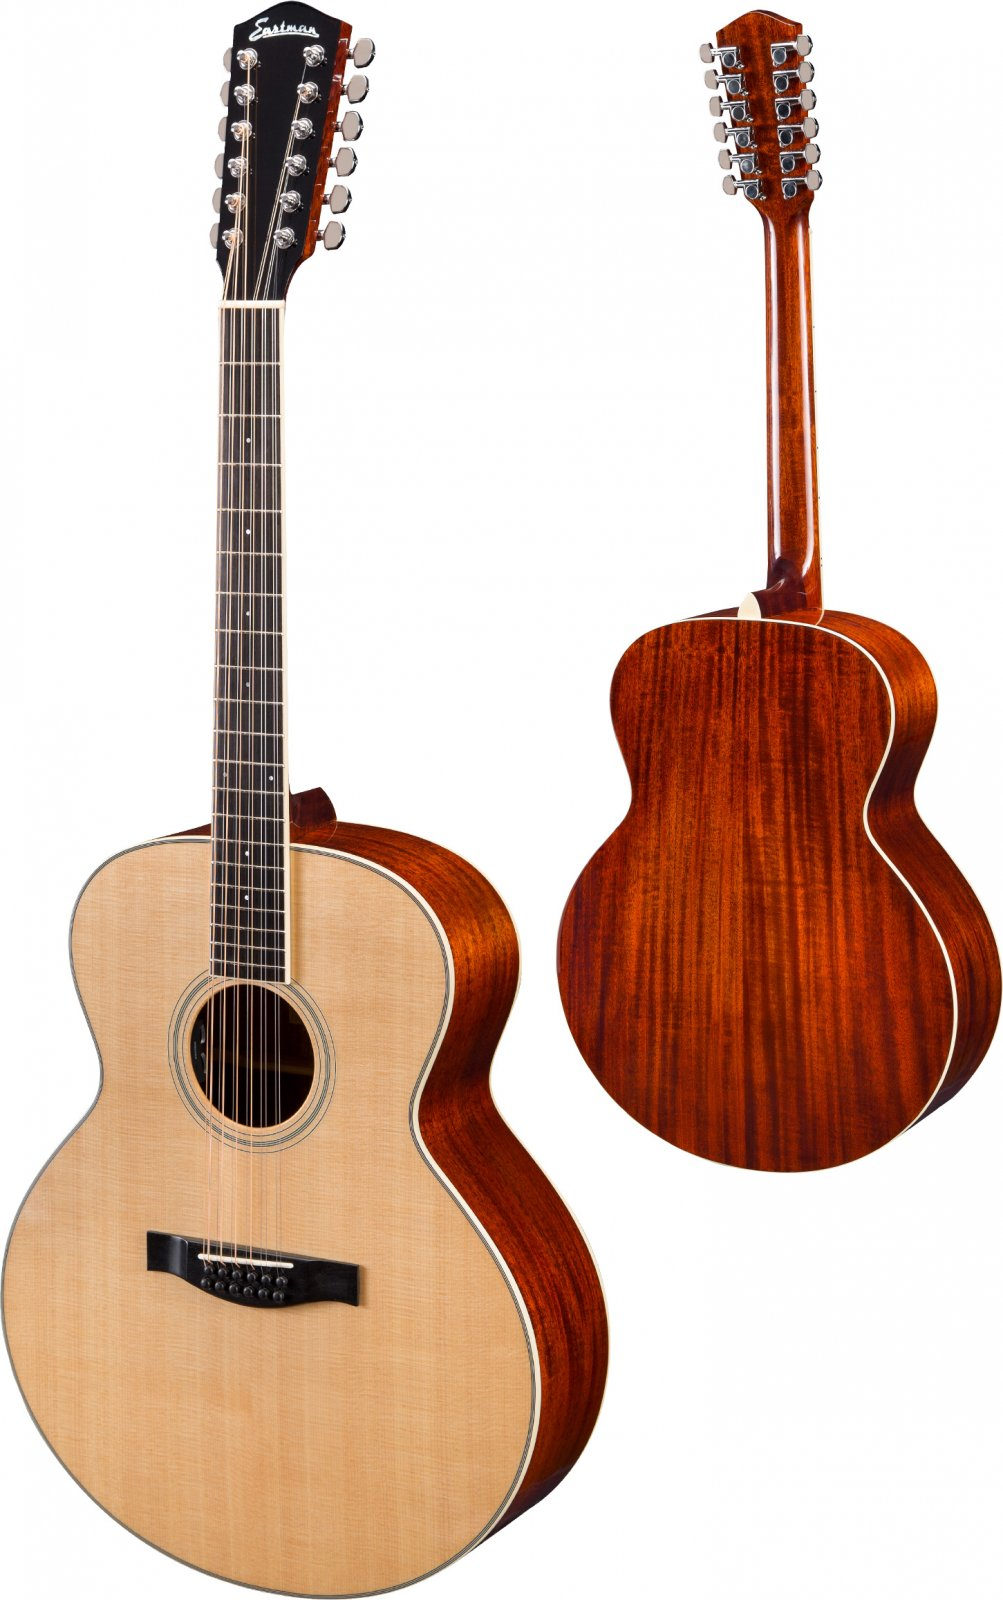 Eastman Jumbo 12 String Guitar AC330E-12